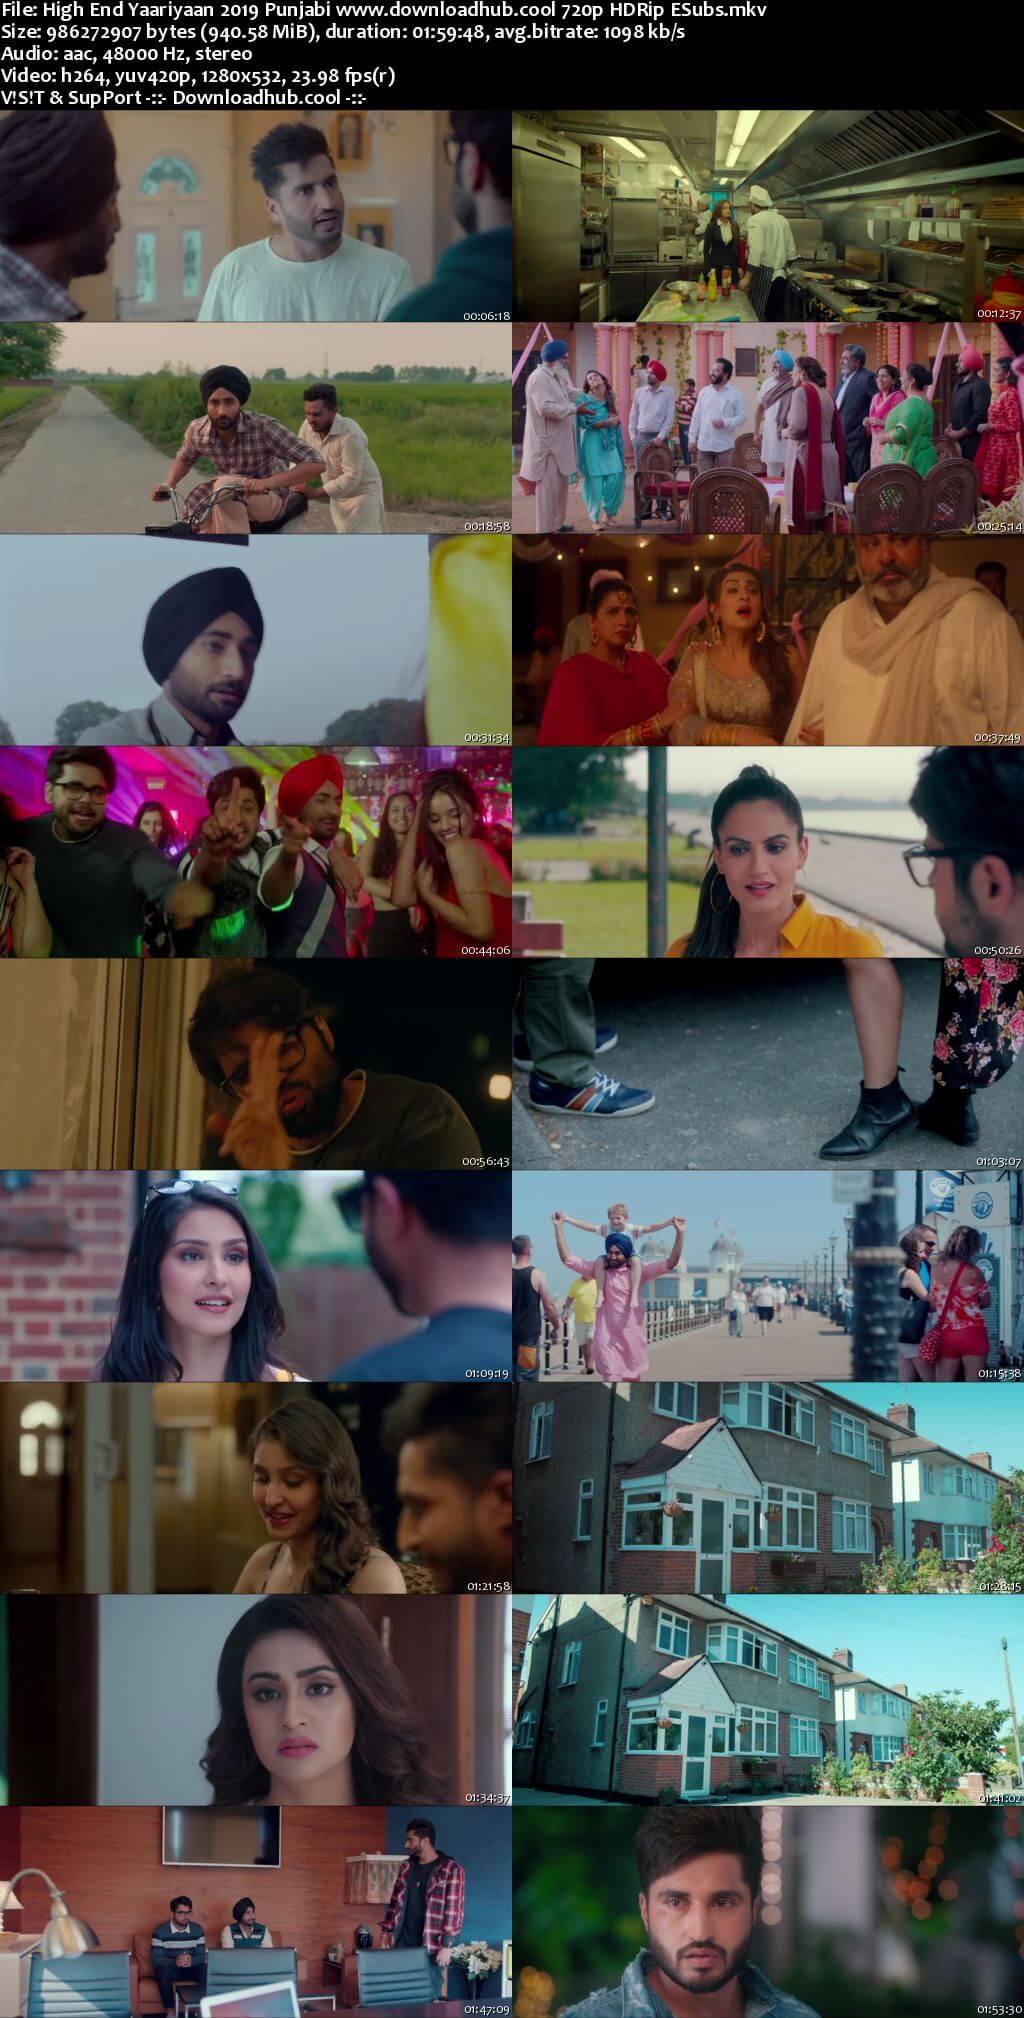 High End Yaariyaan 2019 Punjabi 720p HDRip ESubs